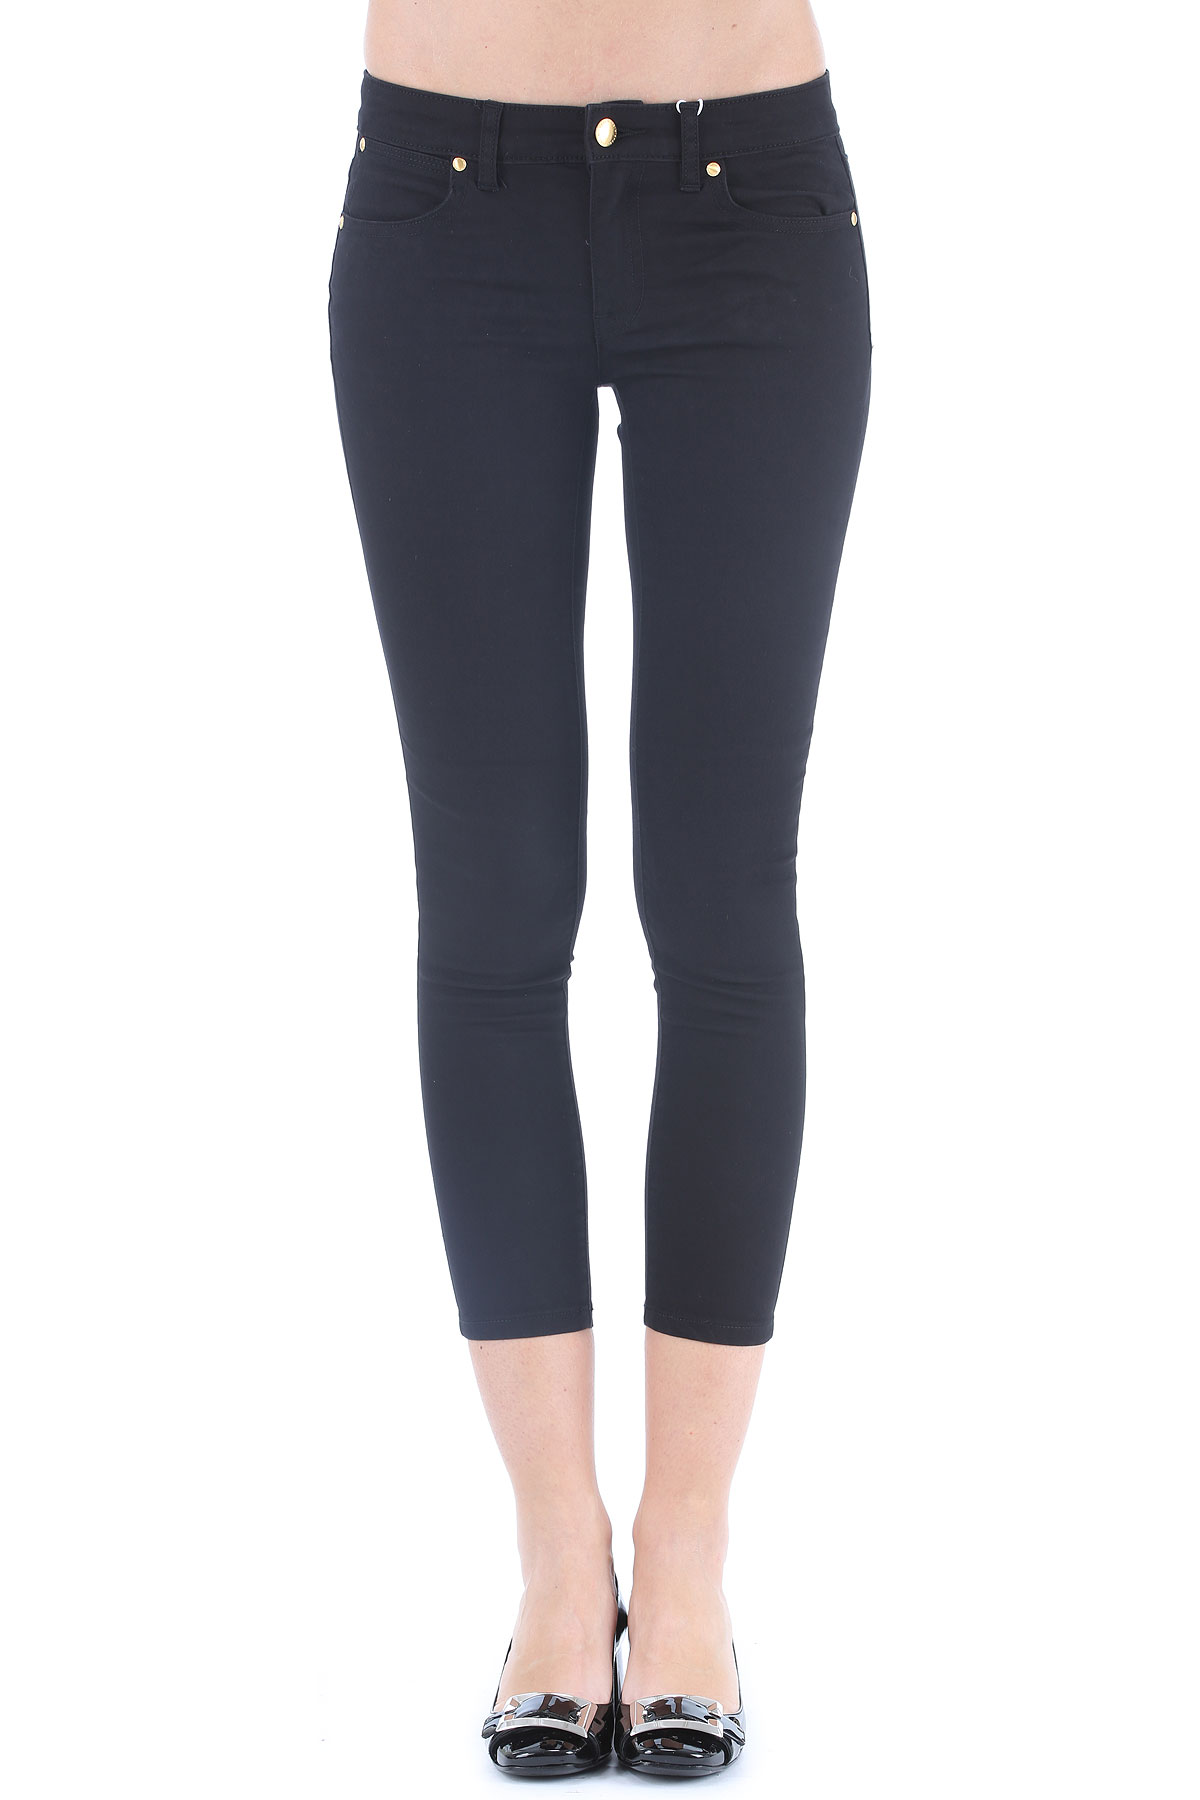 Michael Kors Jeans On Sale, Black, Cotton, 2017, 28 32 USA-347142